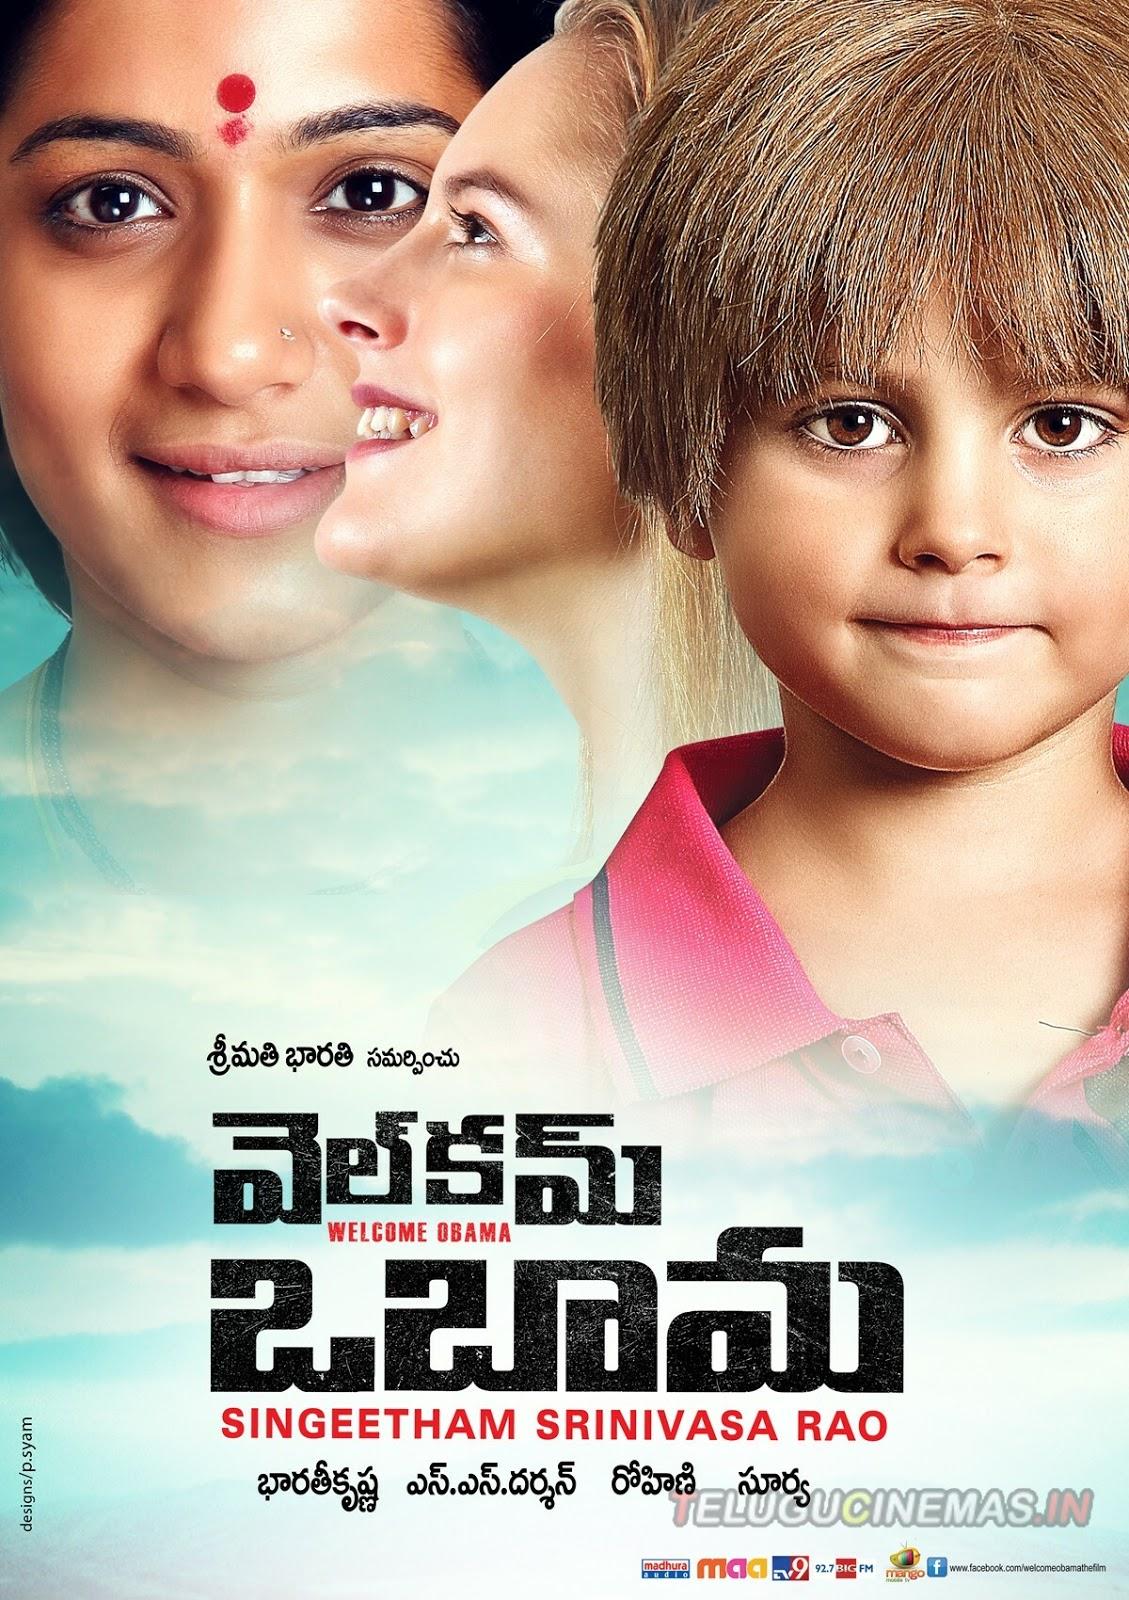 Welcome Obama Movie Posters-Telugucinemas in - TeluguCinemas